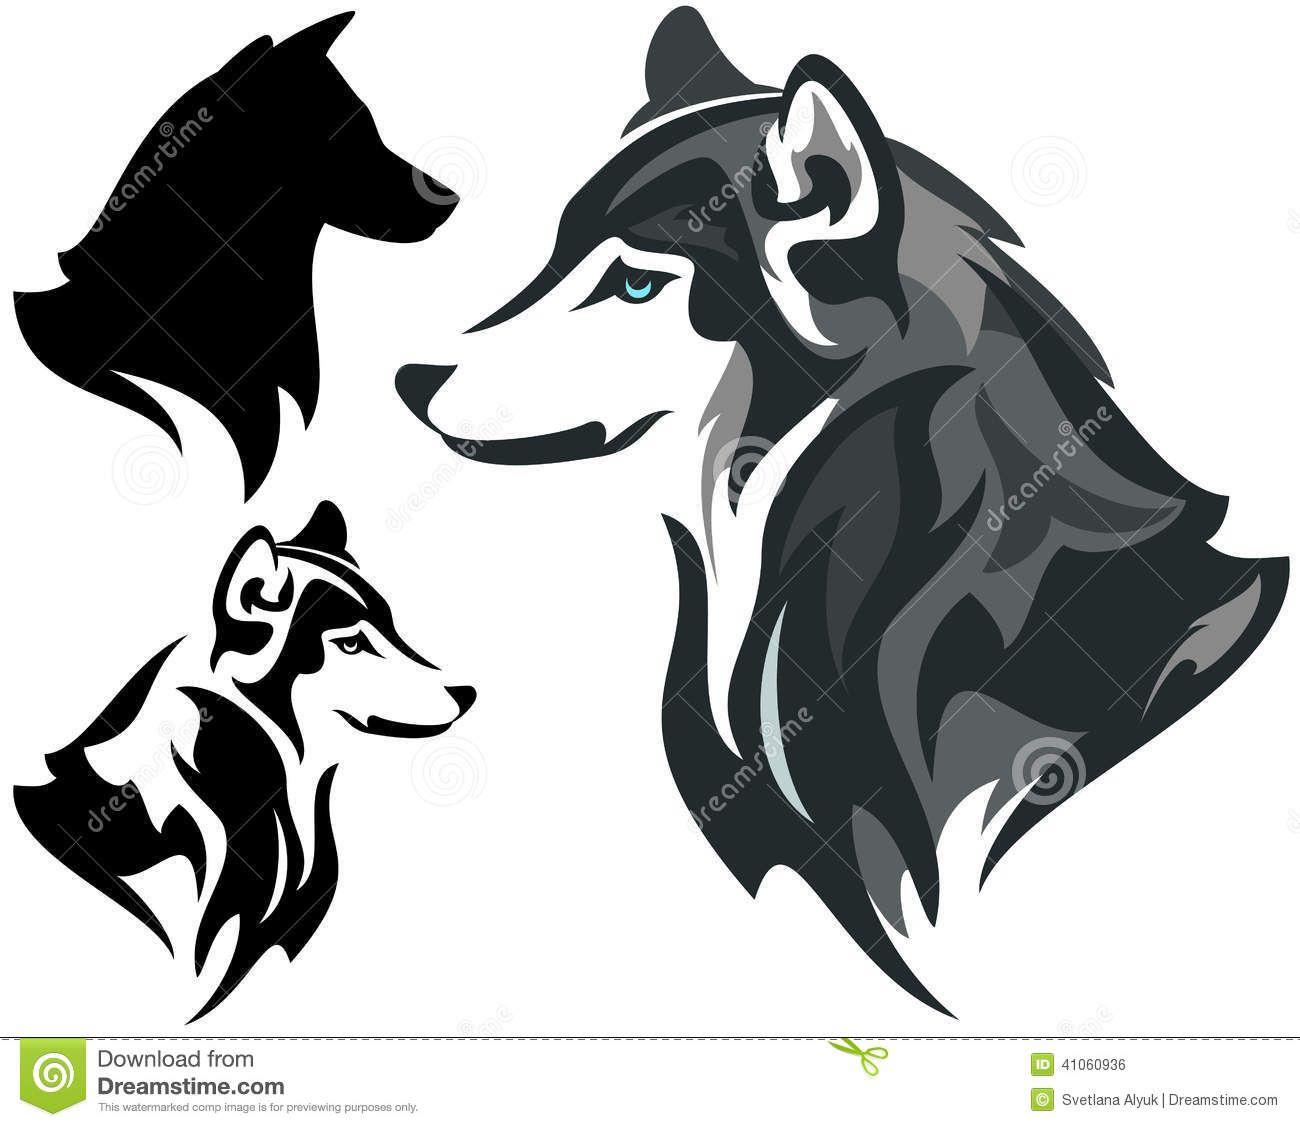 Husky clipart vector. Stock illustrations vectors